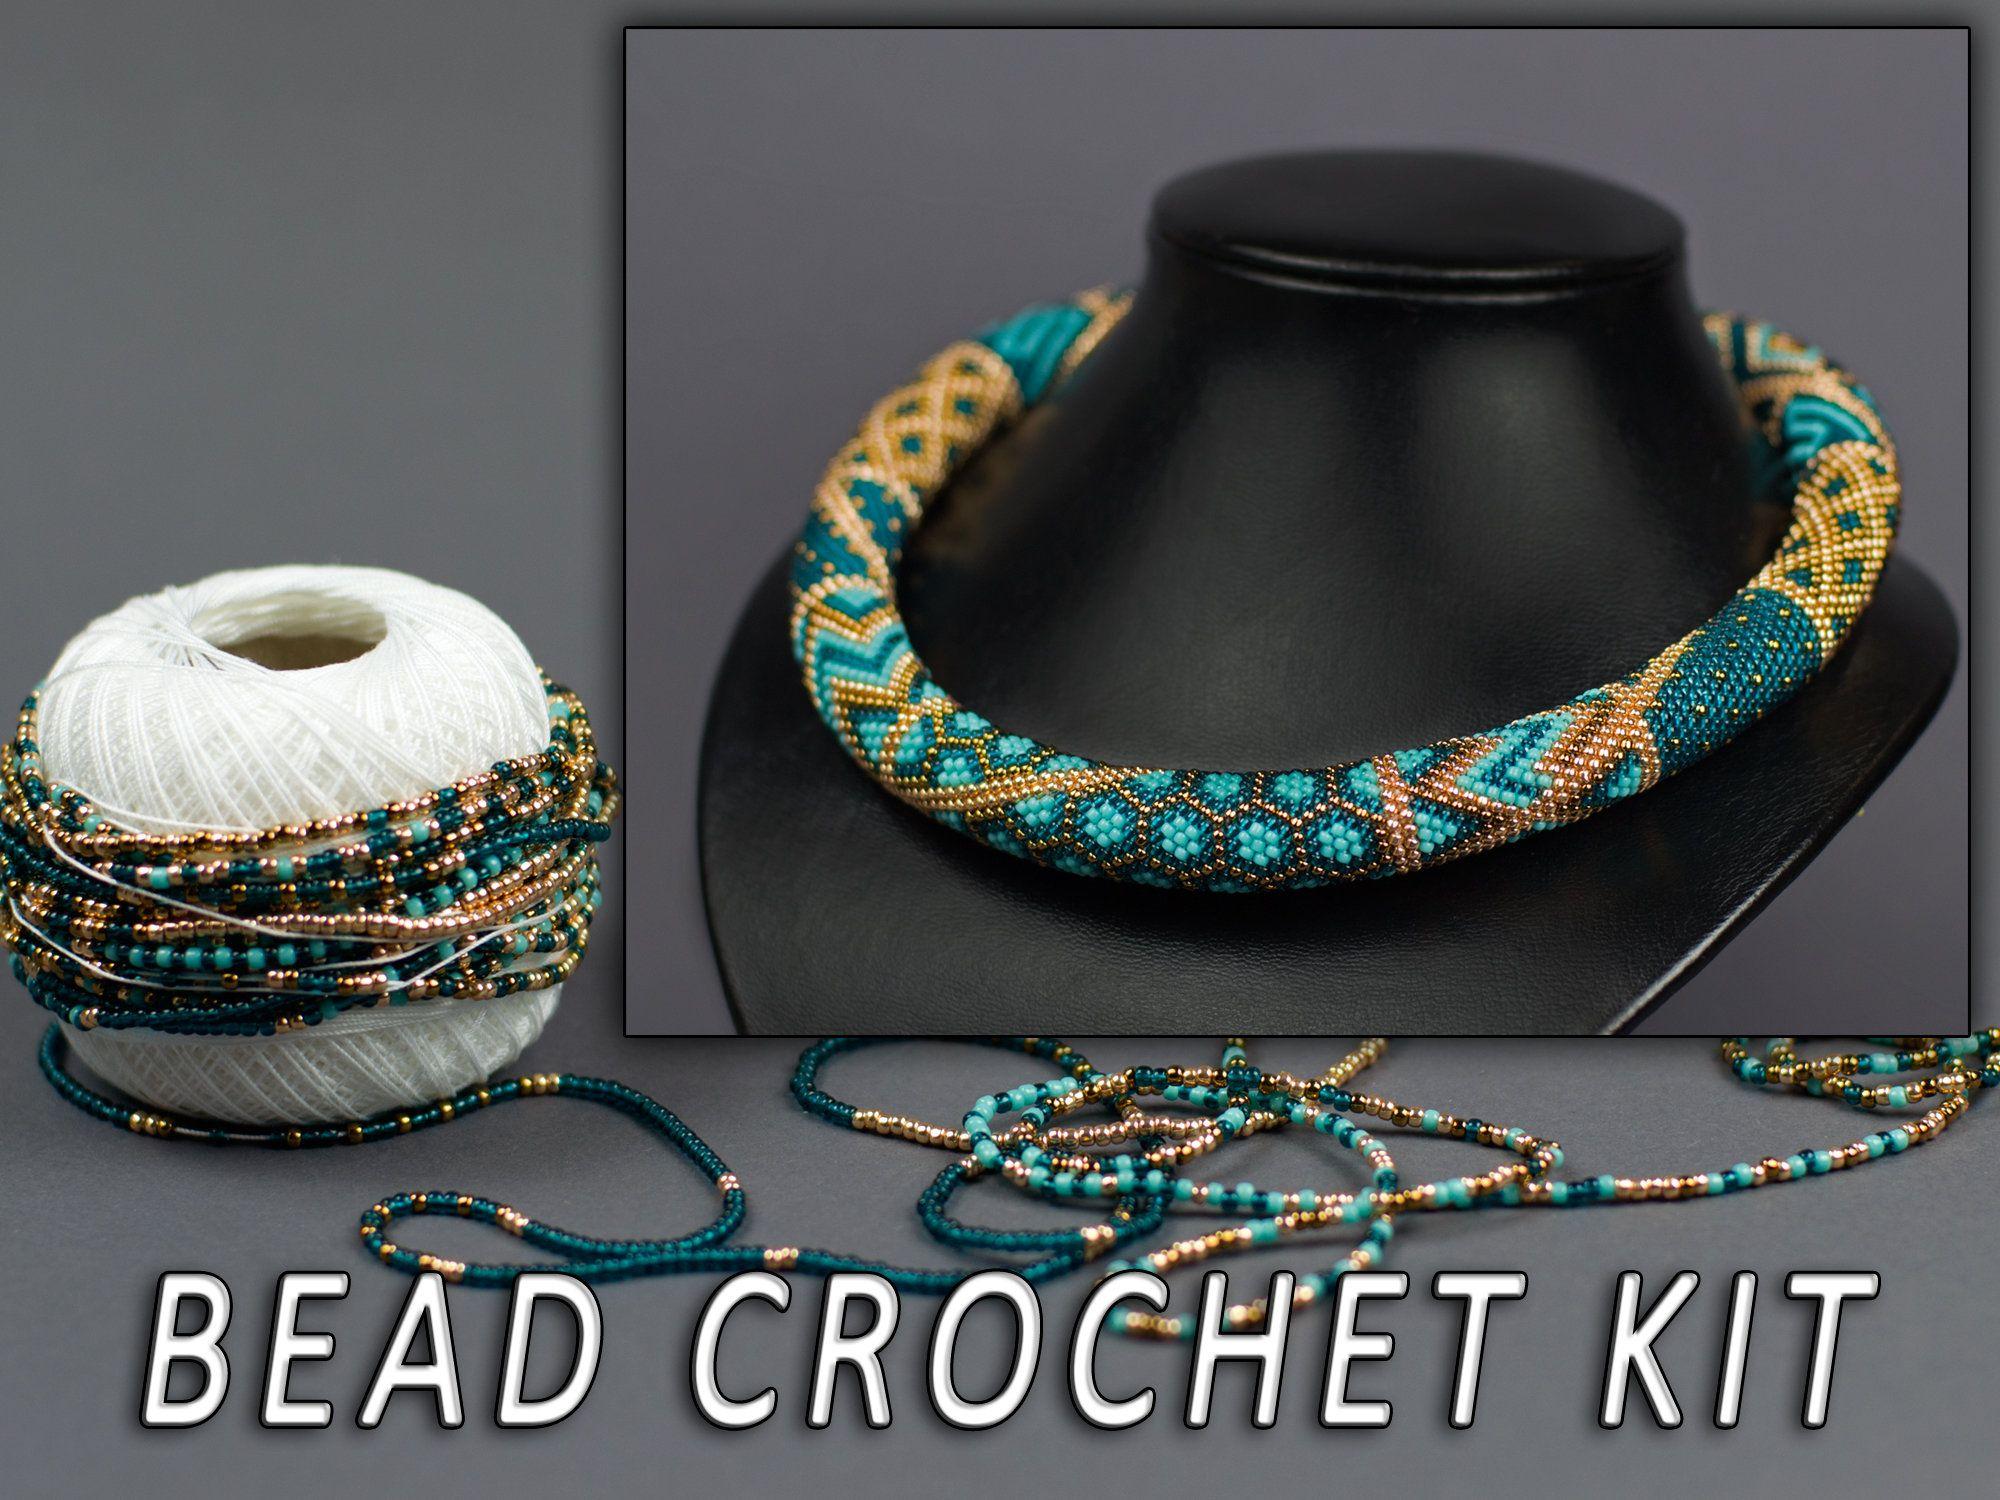 DIY Kit patchwork necklace Adult crafts Bead crochet kit